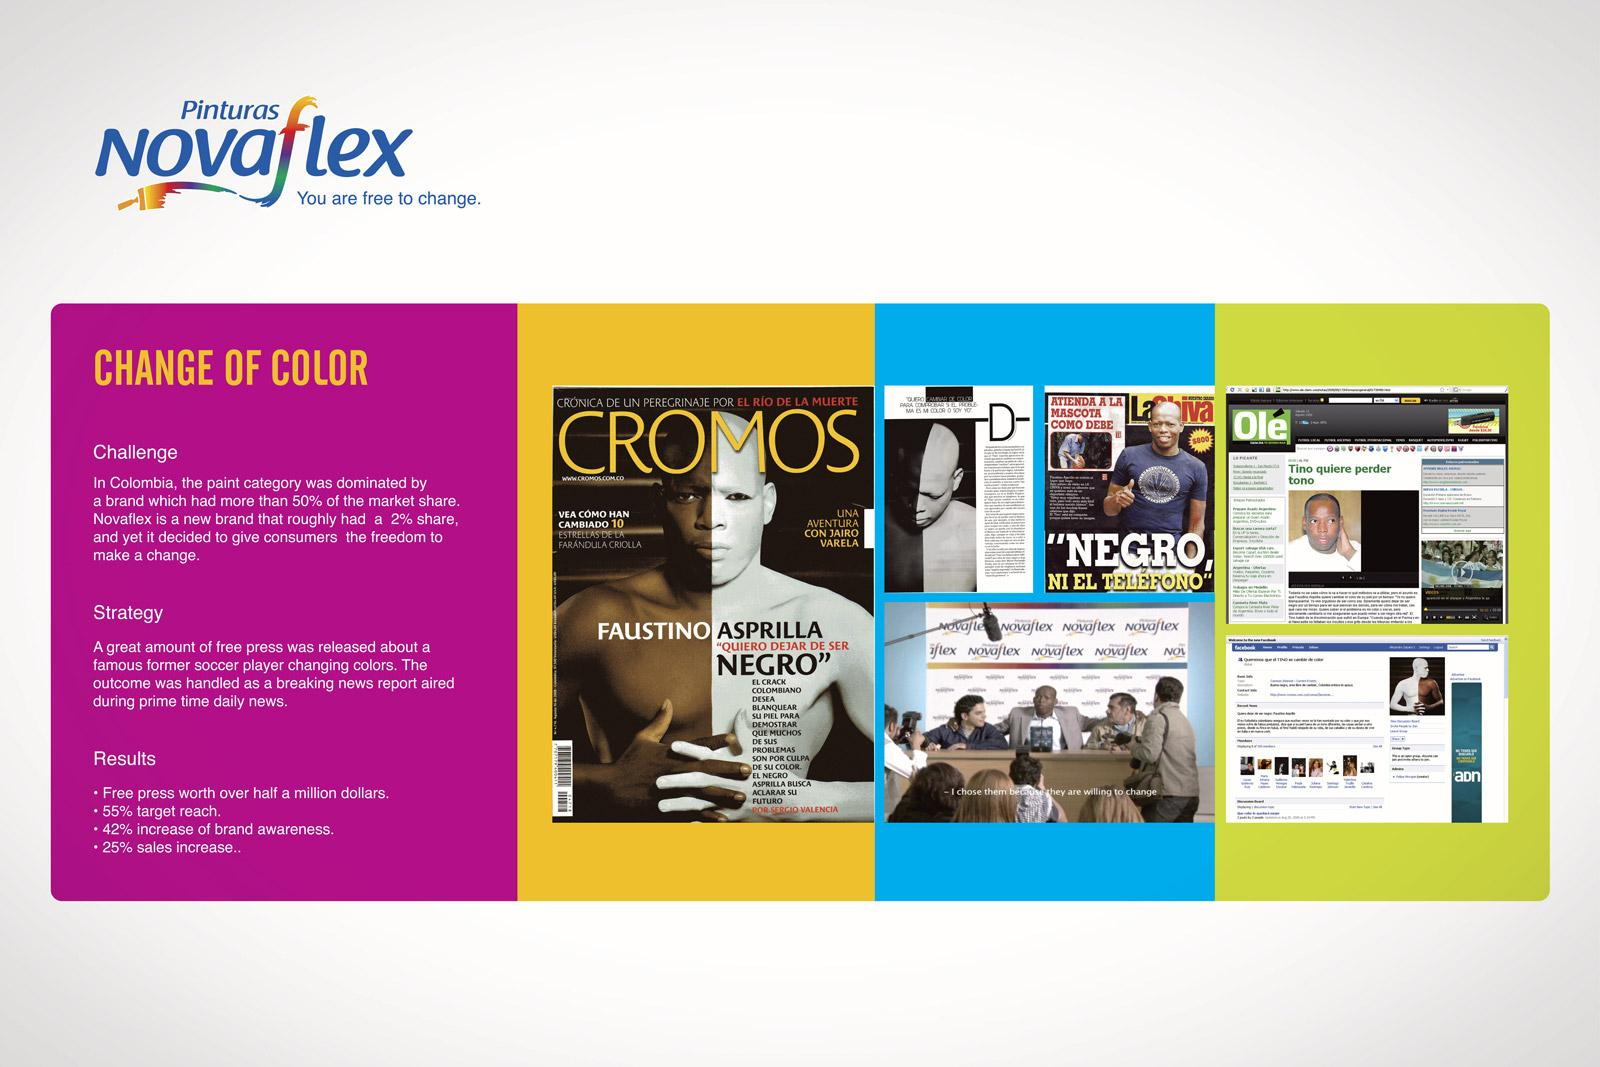 Novaflex Ambient Ad -  Change of color